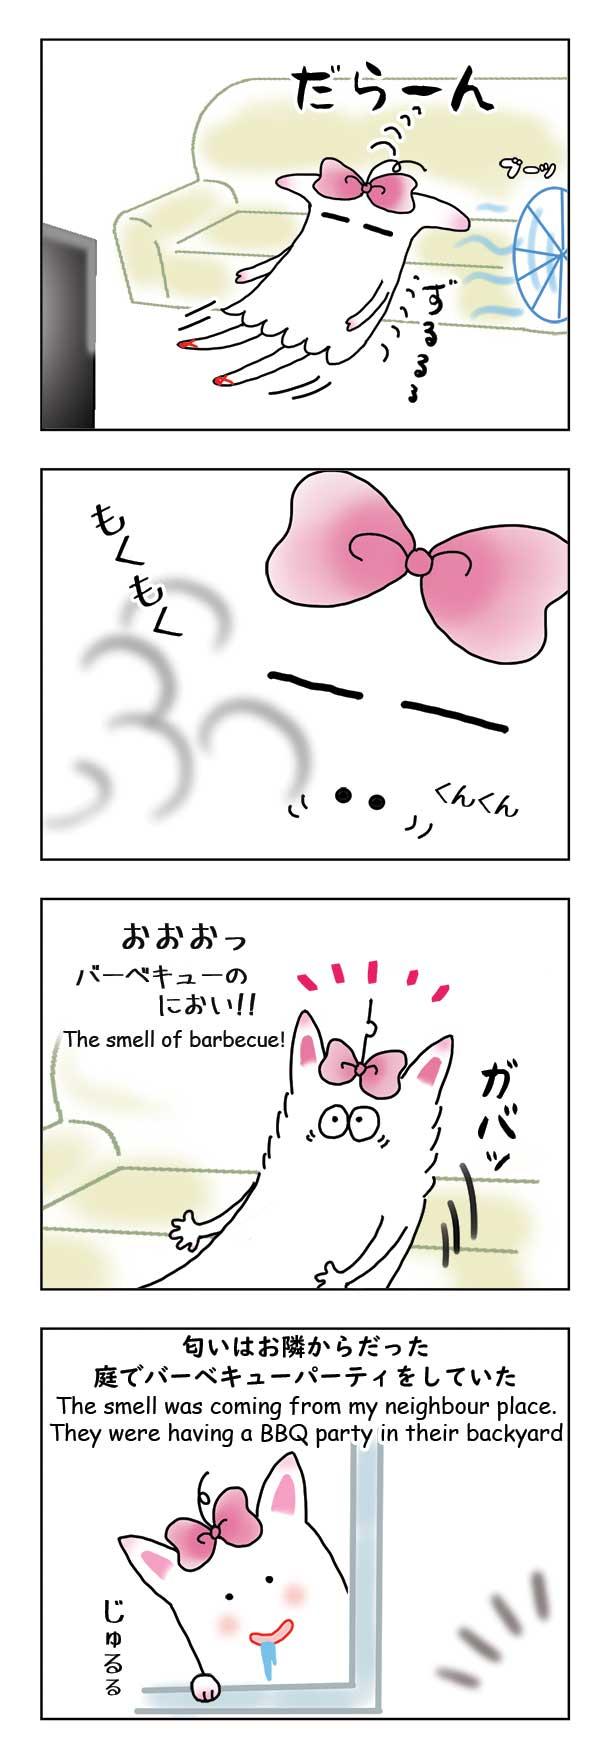 Smelling BBQ